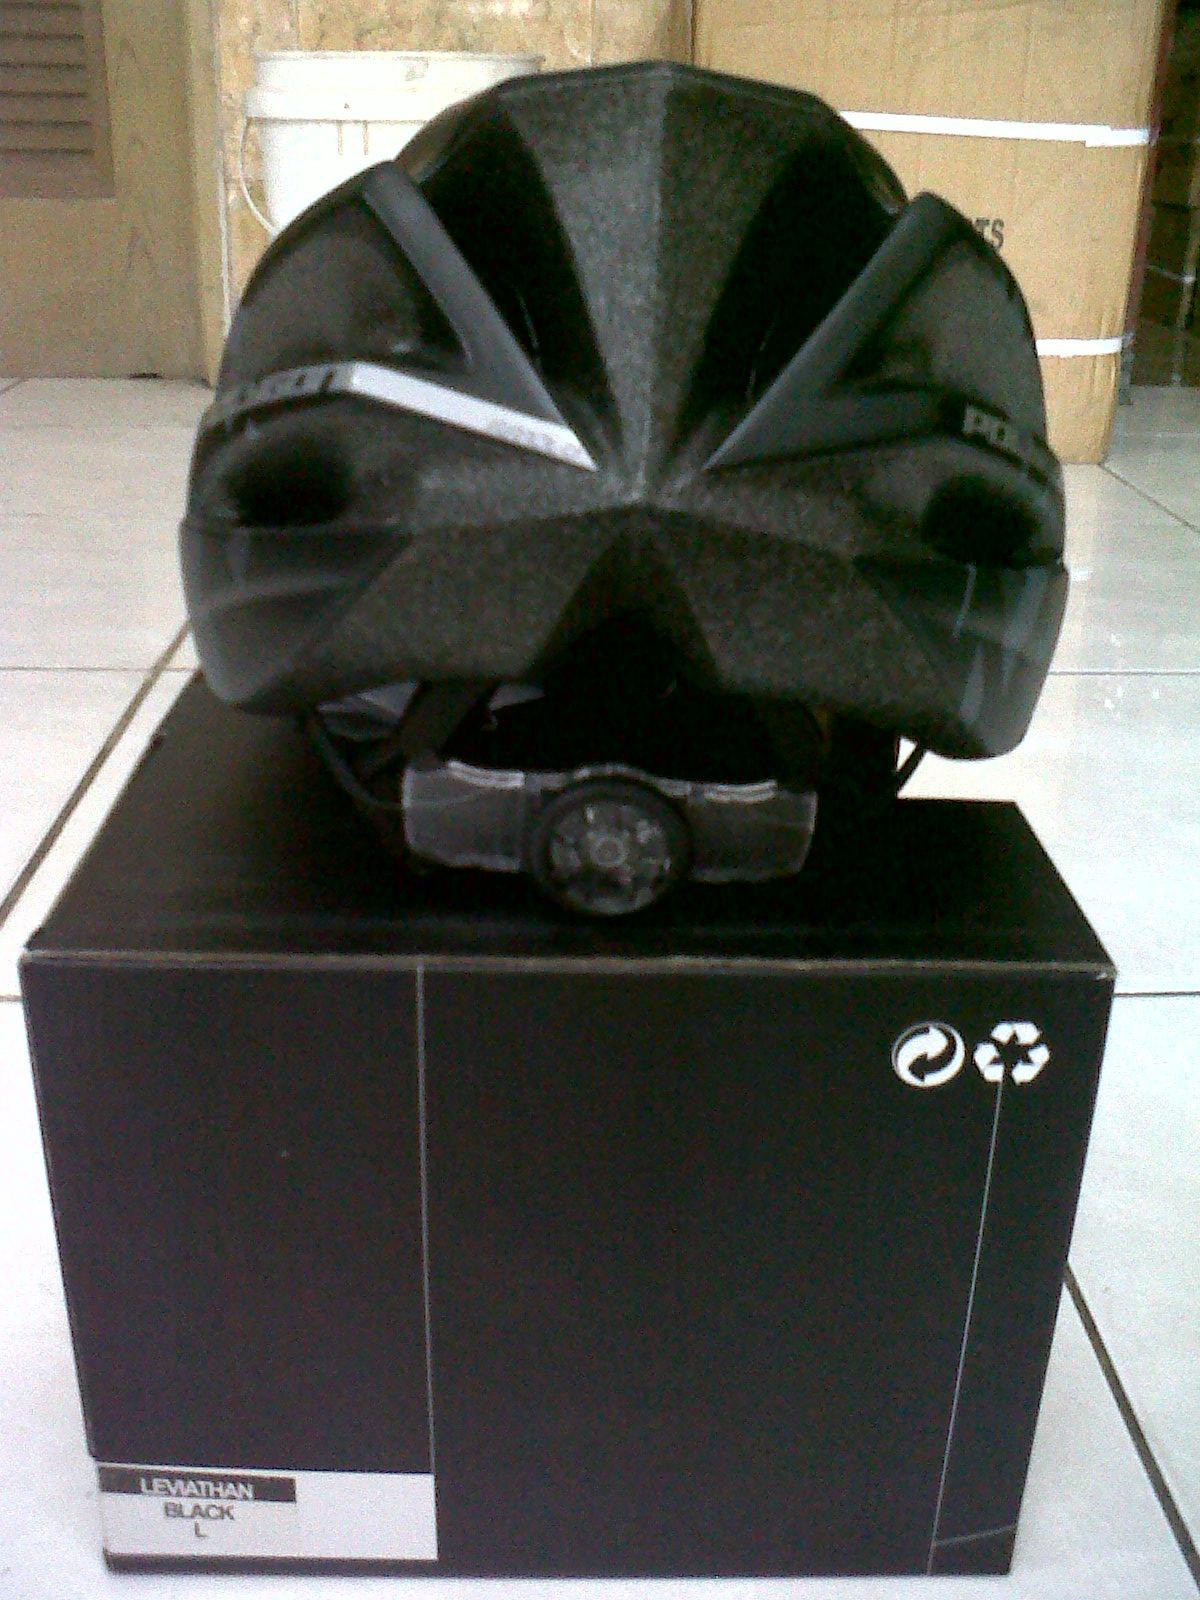 Serba Sepeda Helm Polygon Leviathan Harga Rp 150000 Balap Helios A60 700c